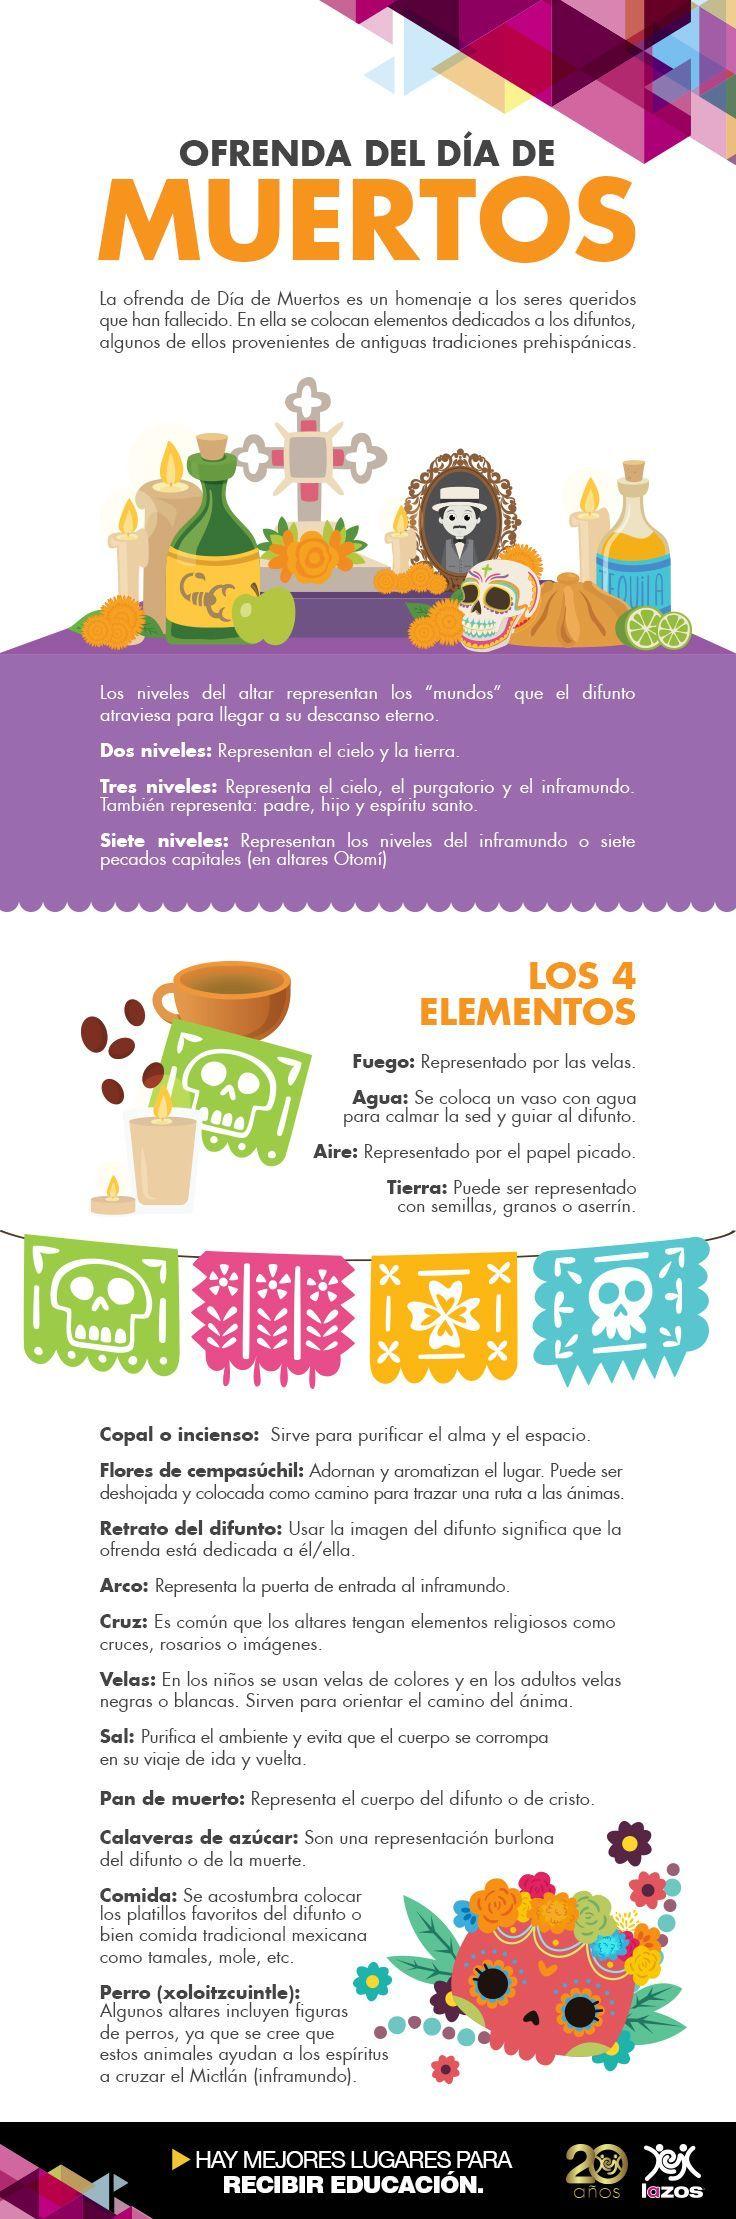 Infographic on building an ofrenda for dia de los muertos